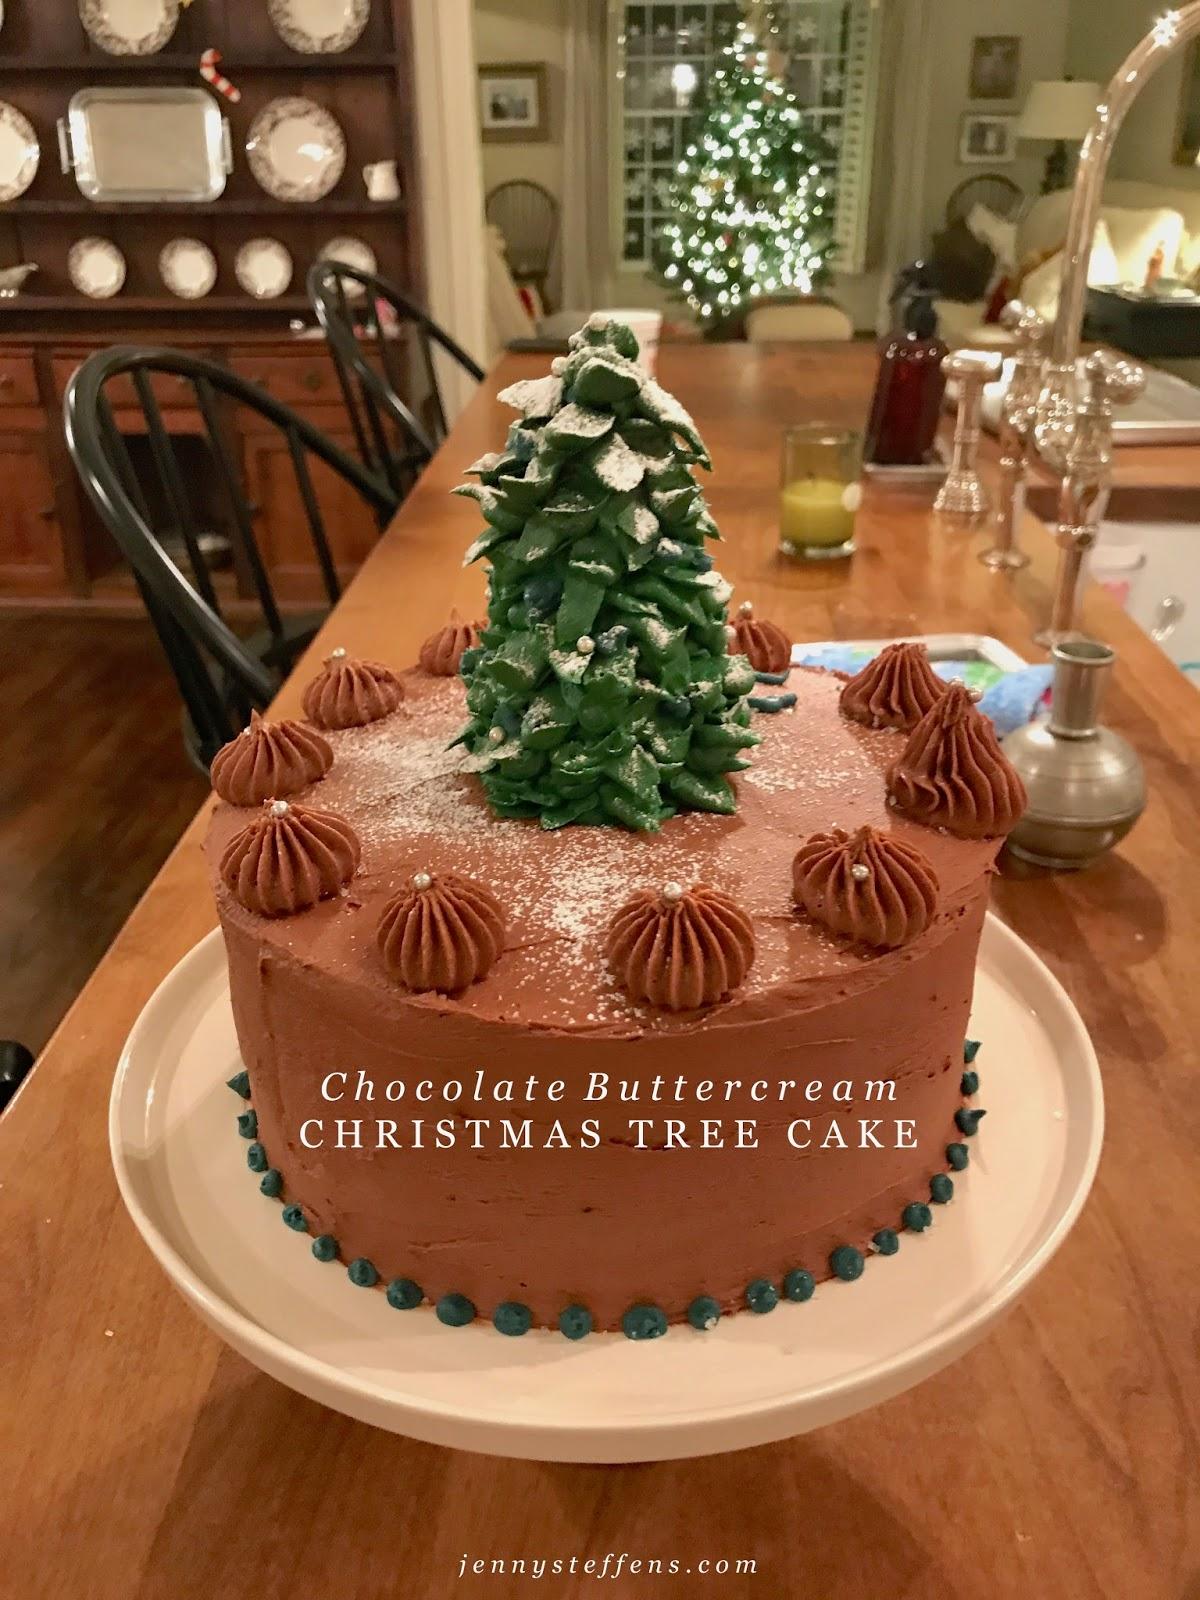 Jenny Steffens Hobick Chocolate Buttercream Christmas Tree Cake